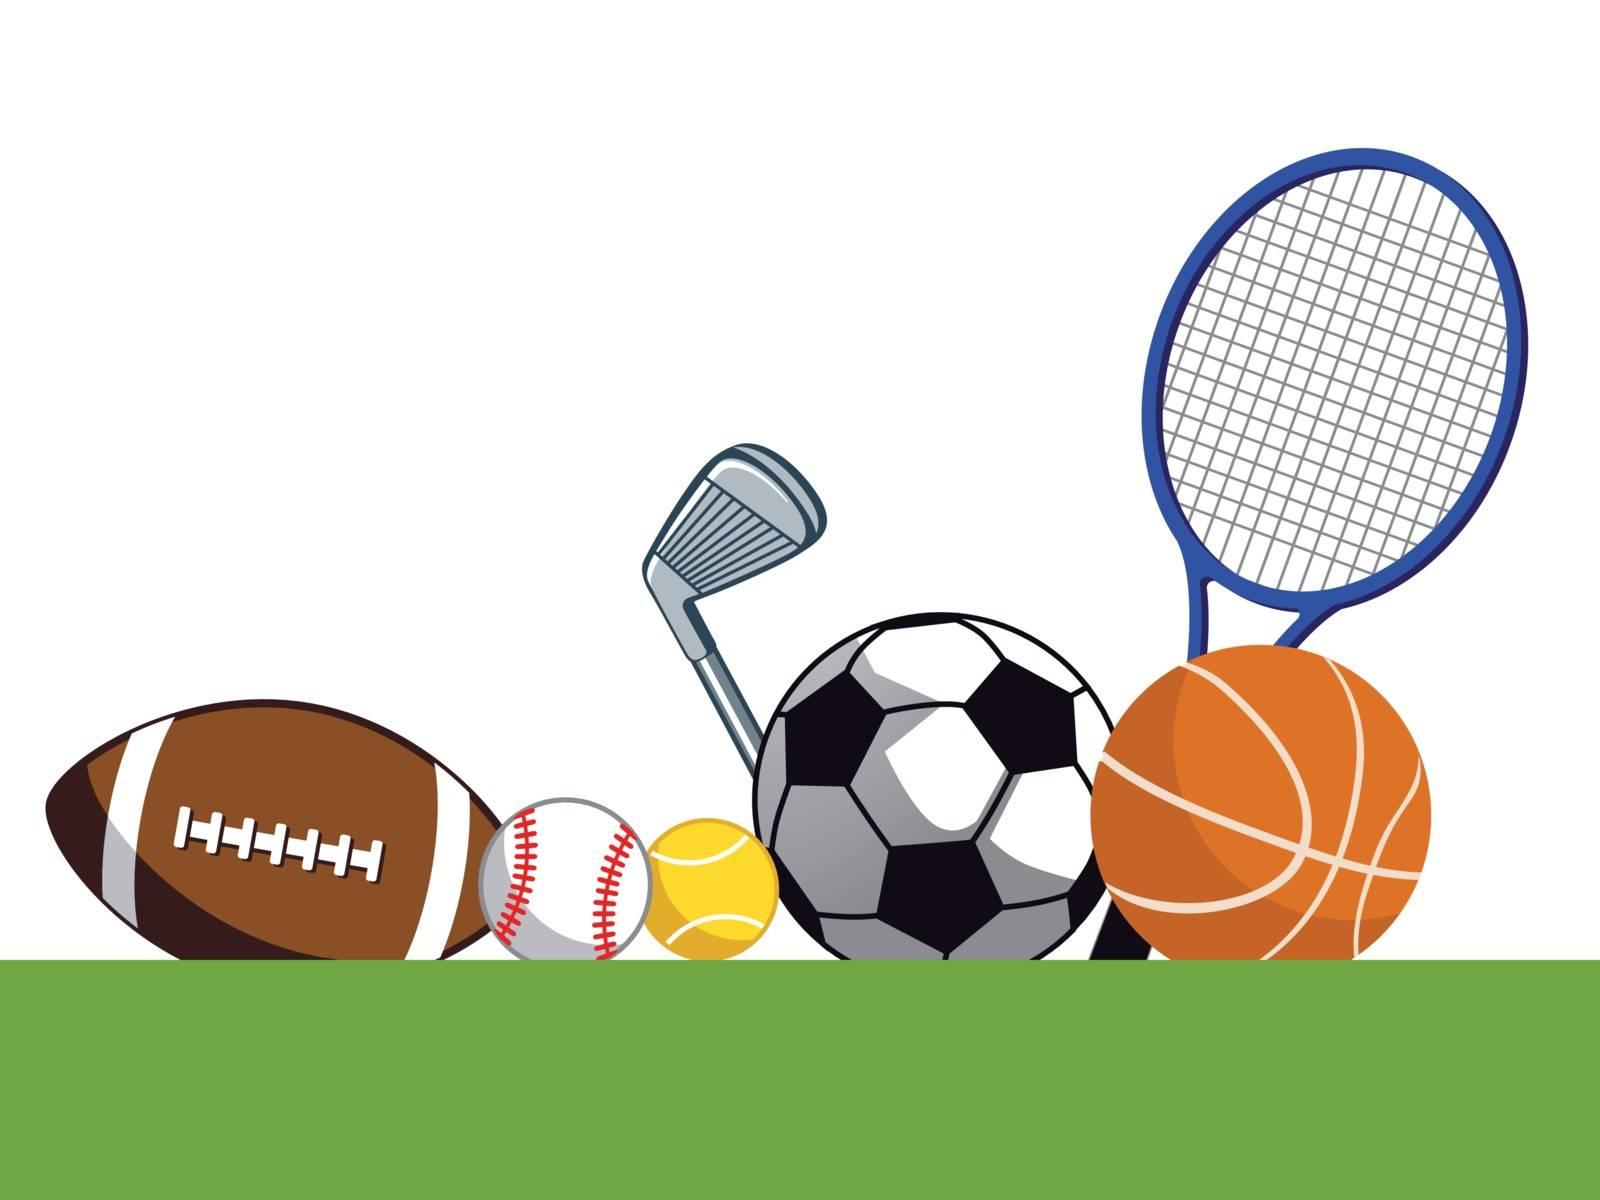 sporting equipment by scusi